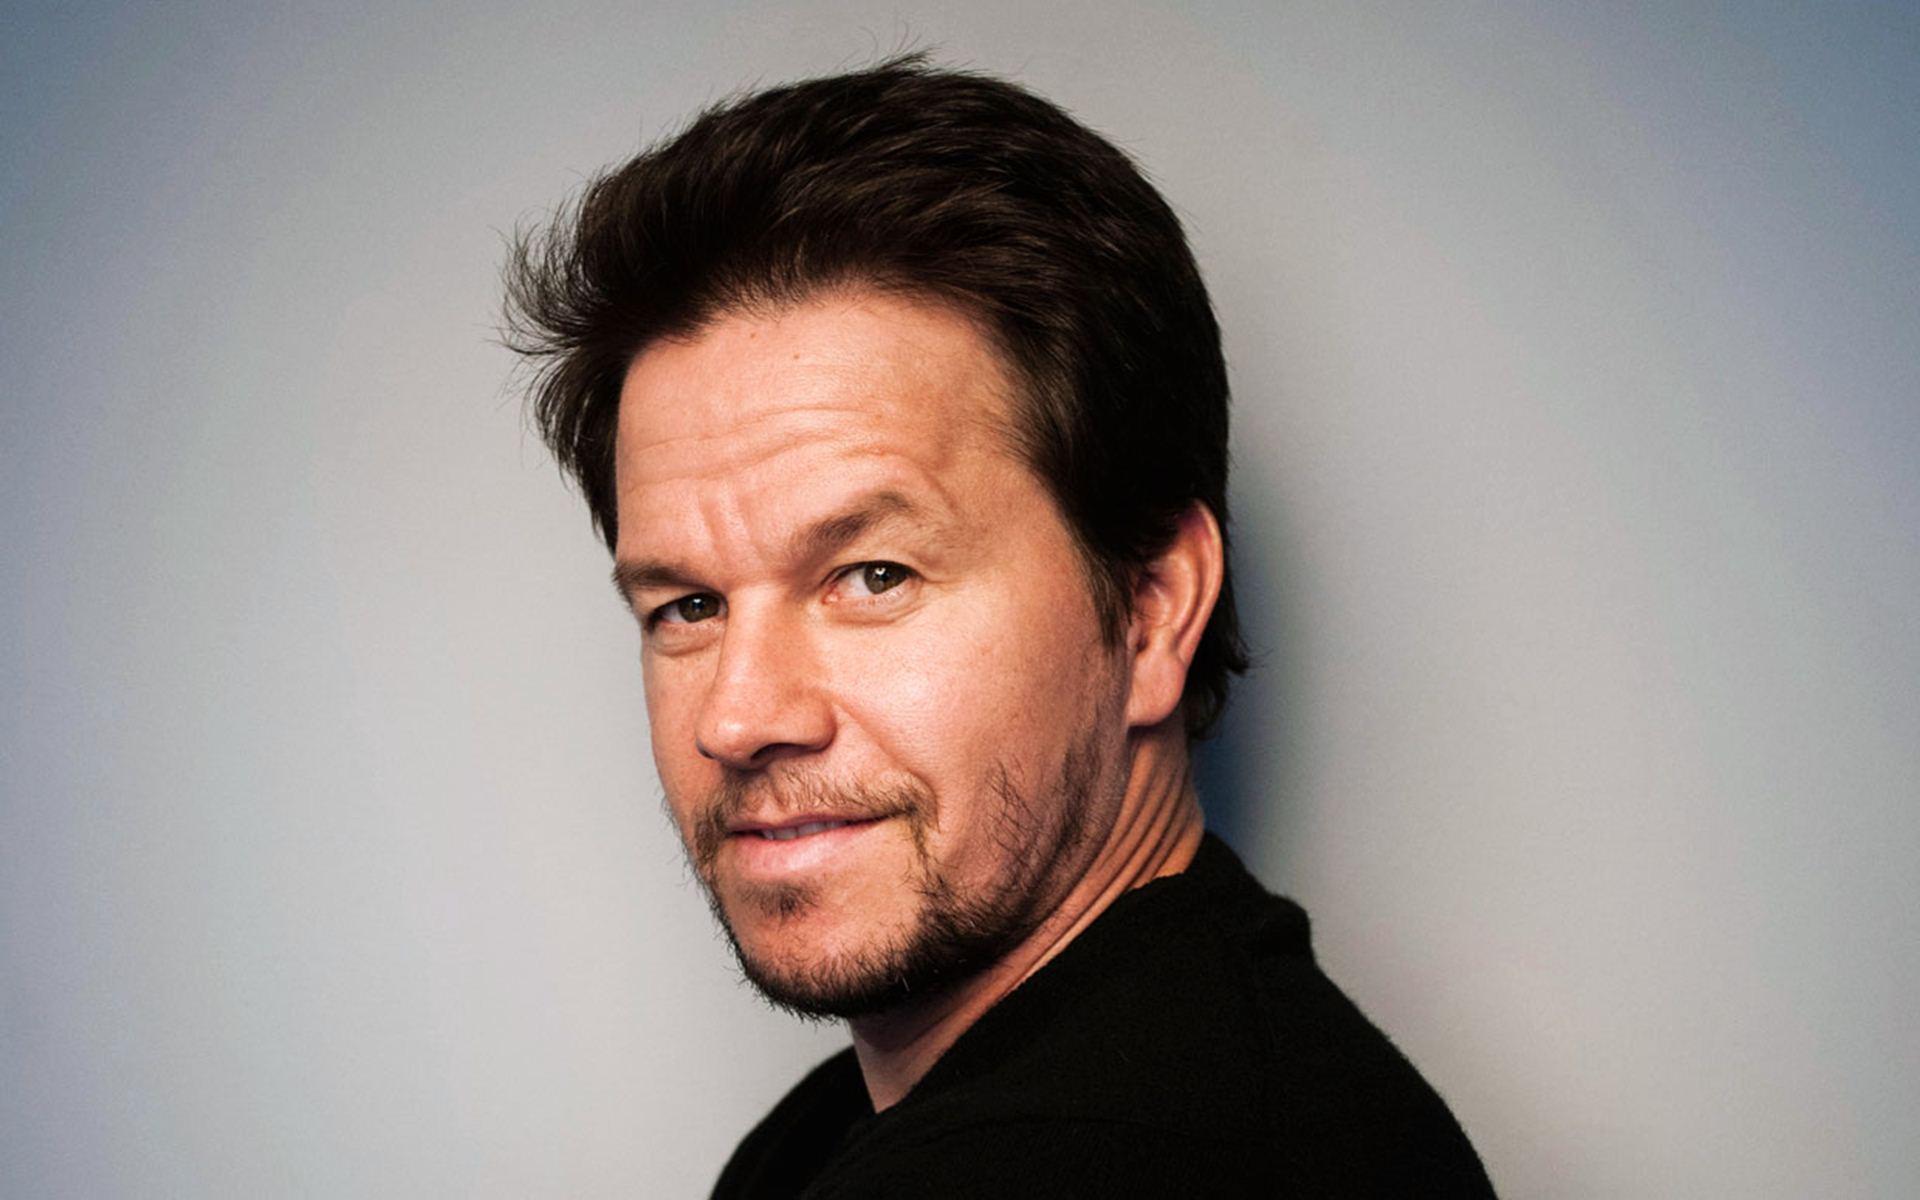 Mark Wahlberg wallpaper 1920x1200 50274 1920x1200